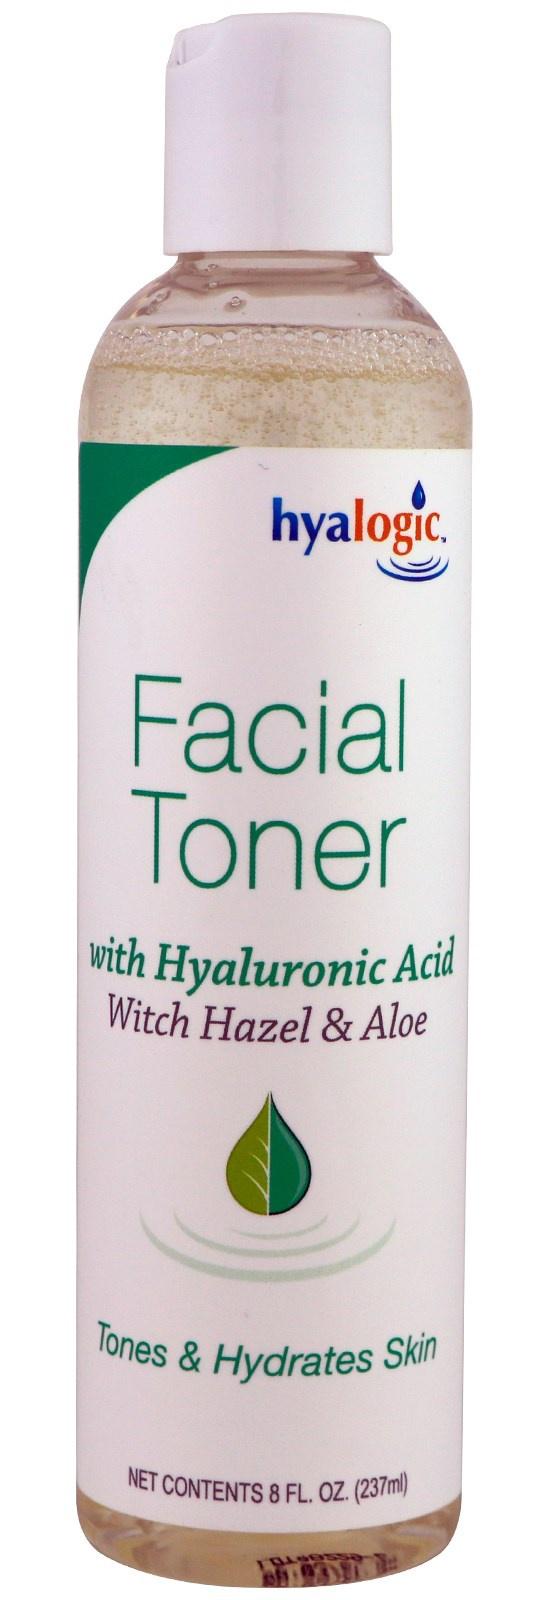 Hyalogic Facial Toner